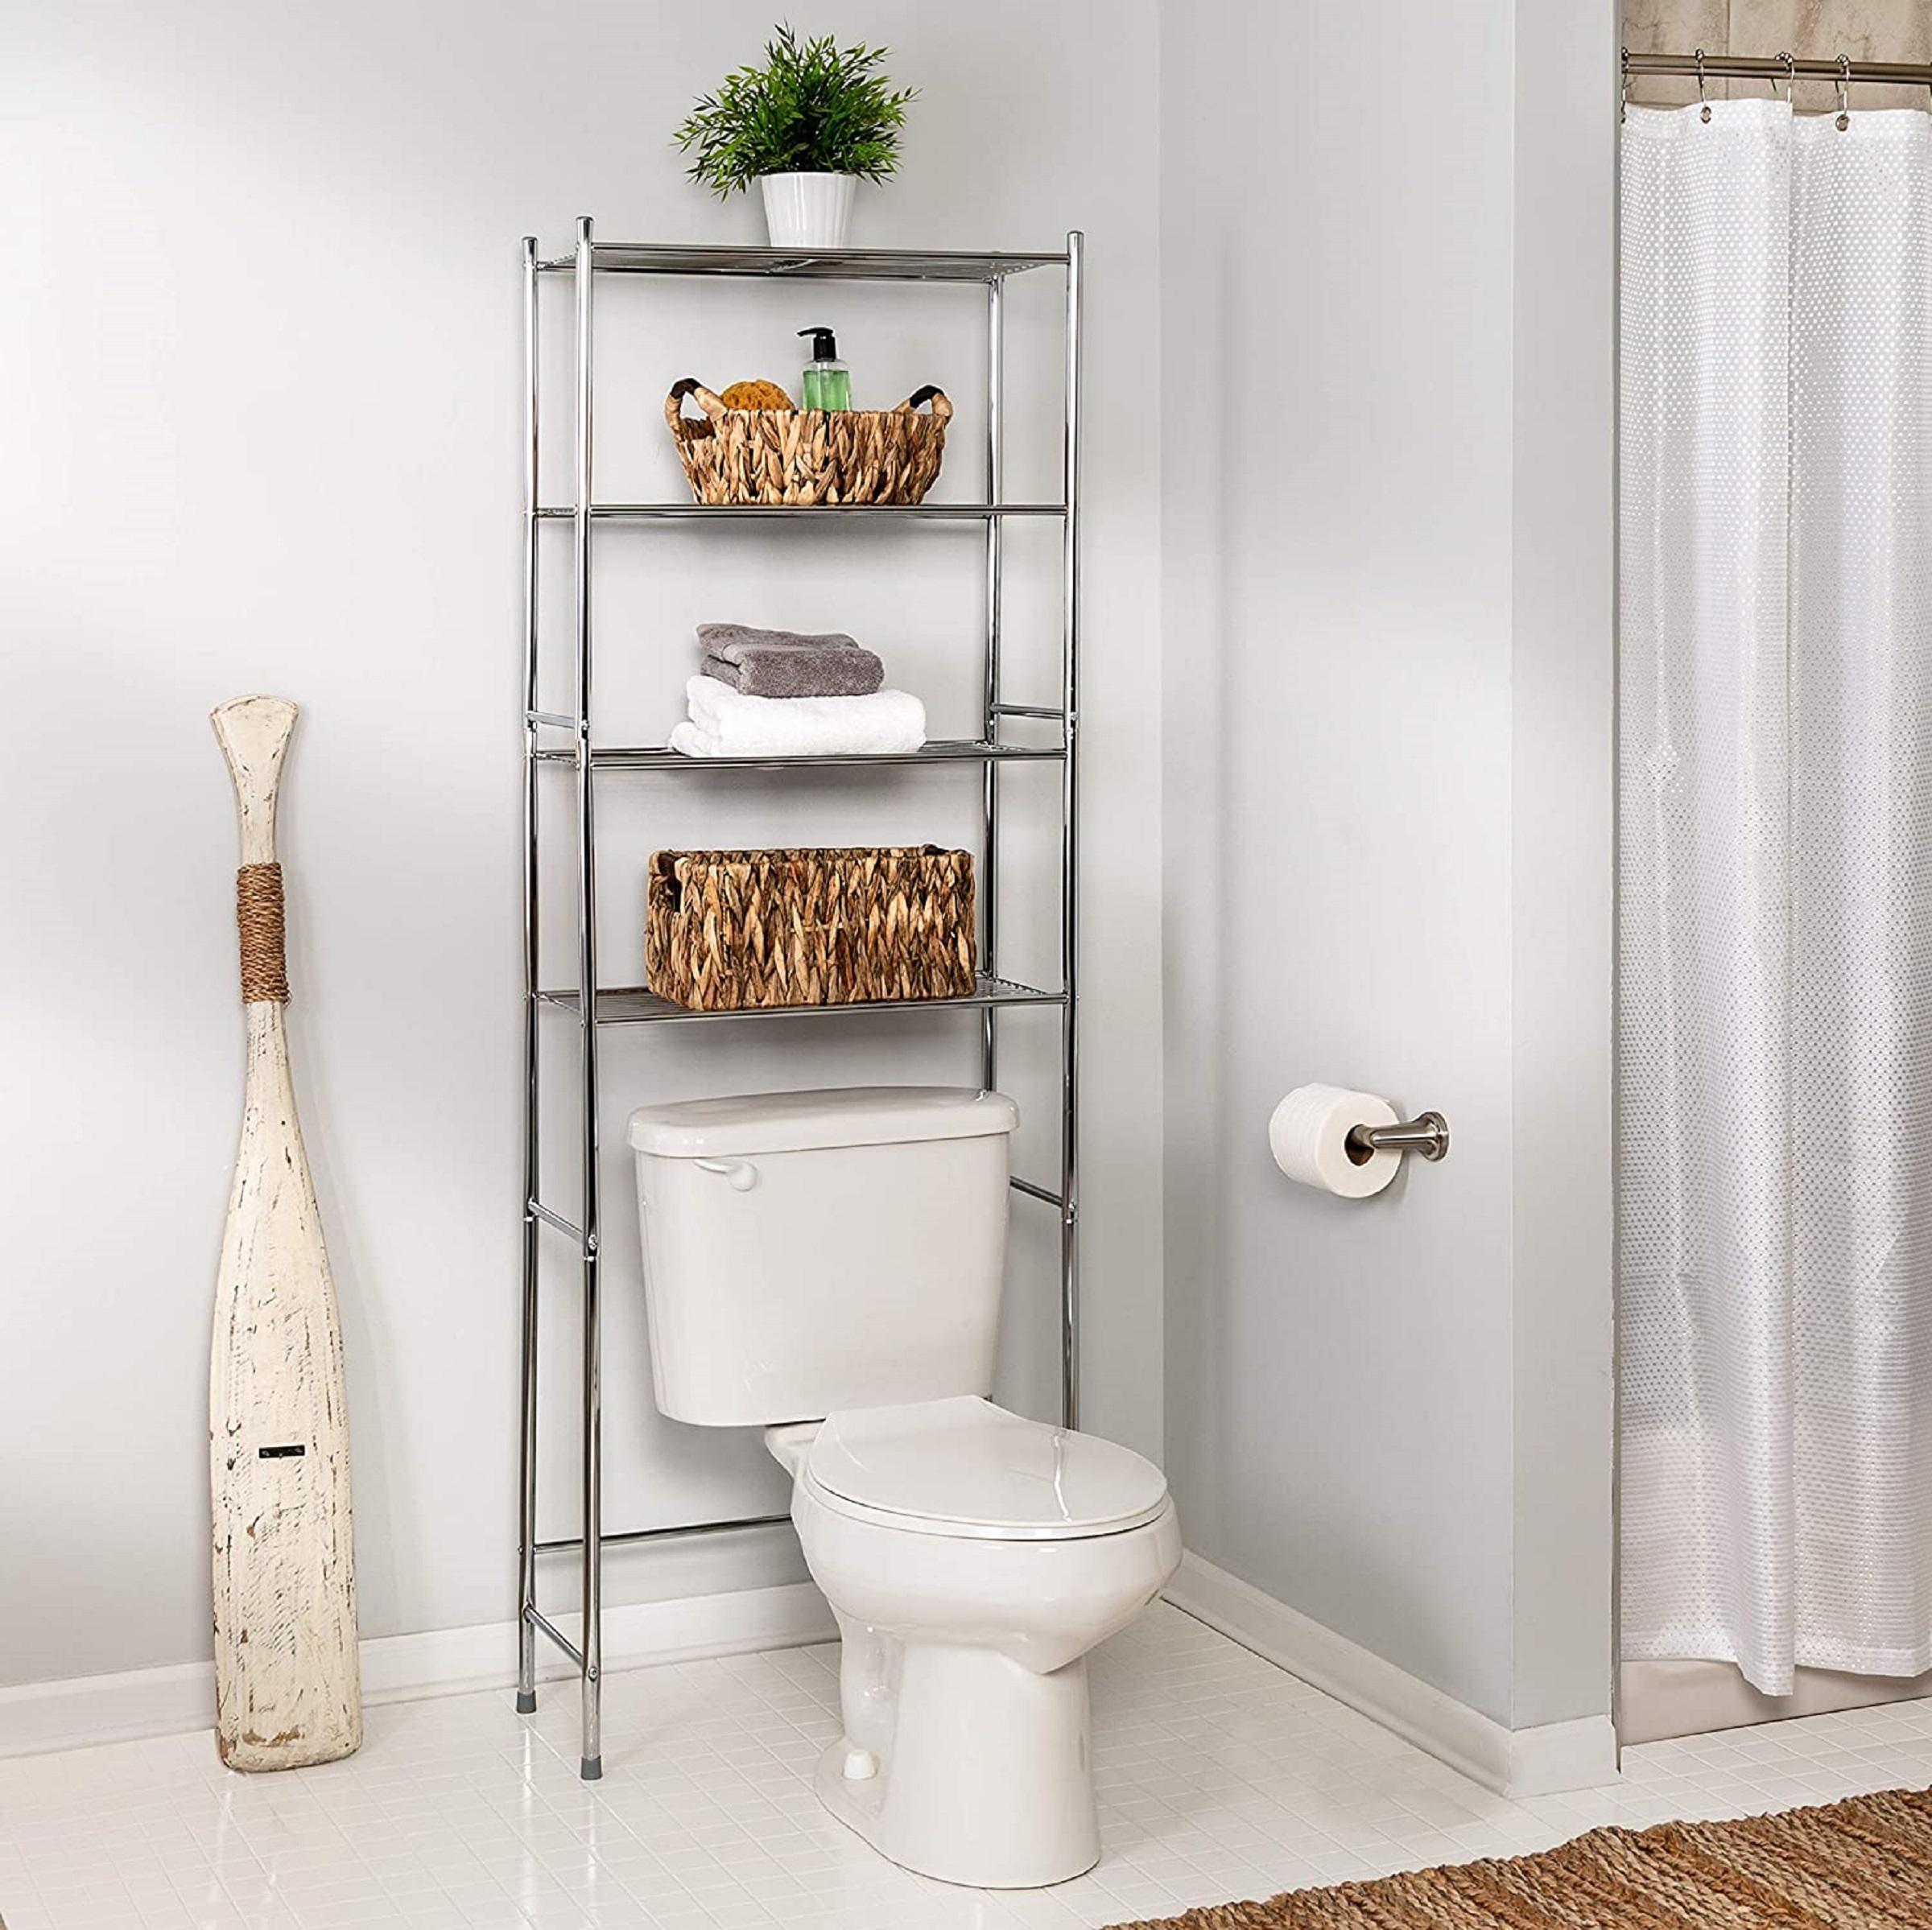 Over-Toilet Bathroom Organizer